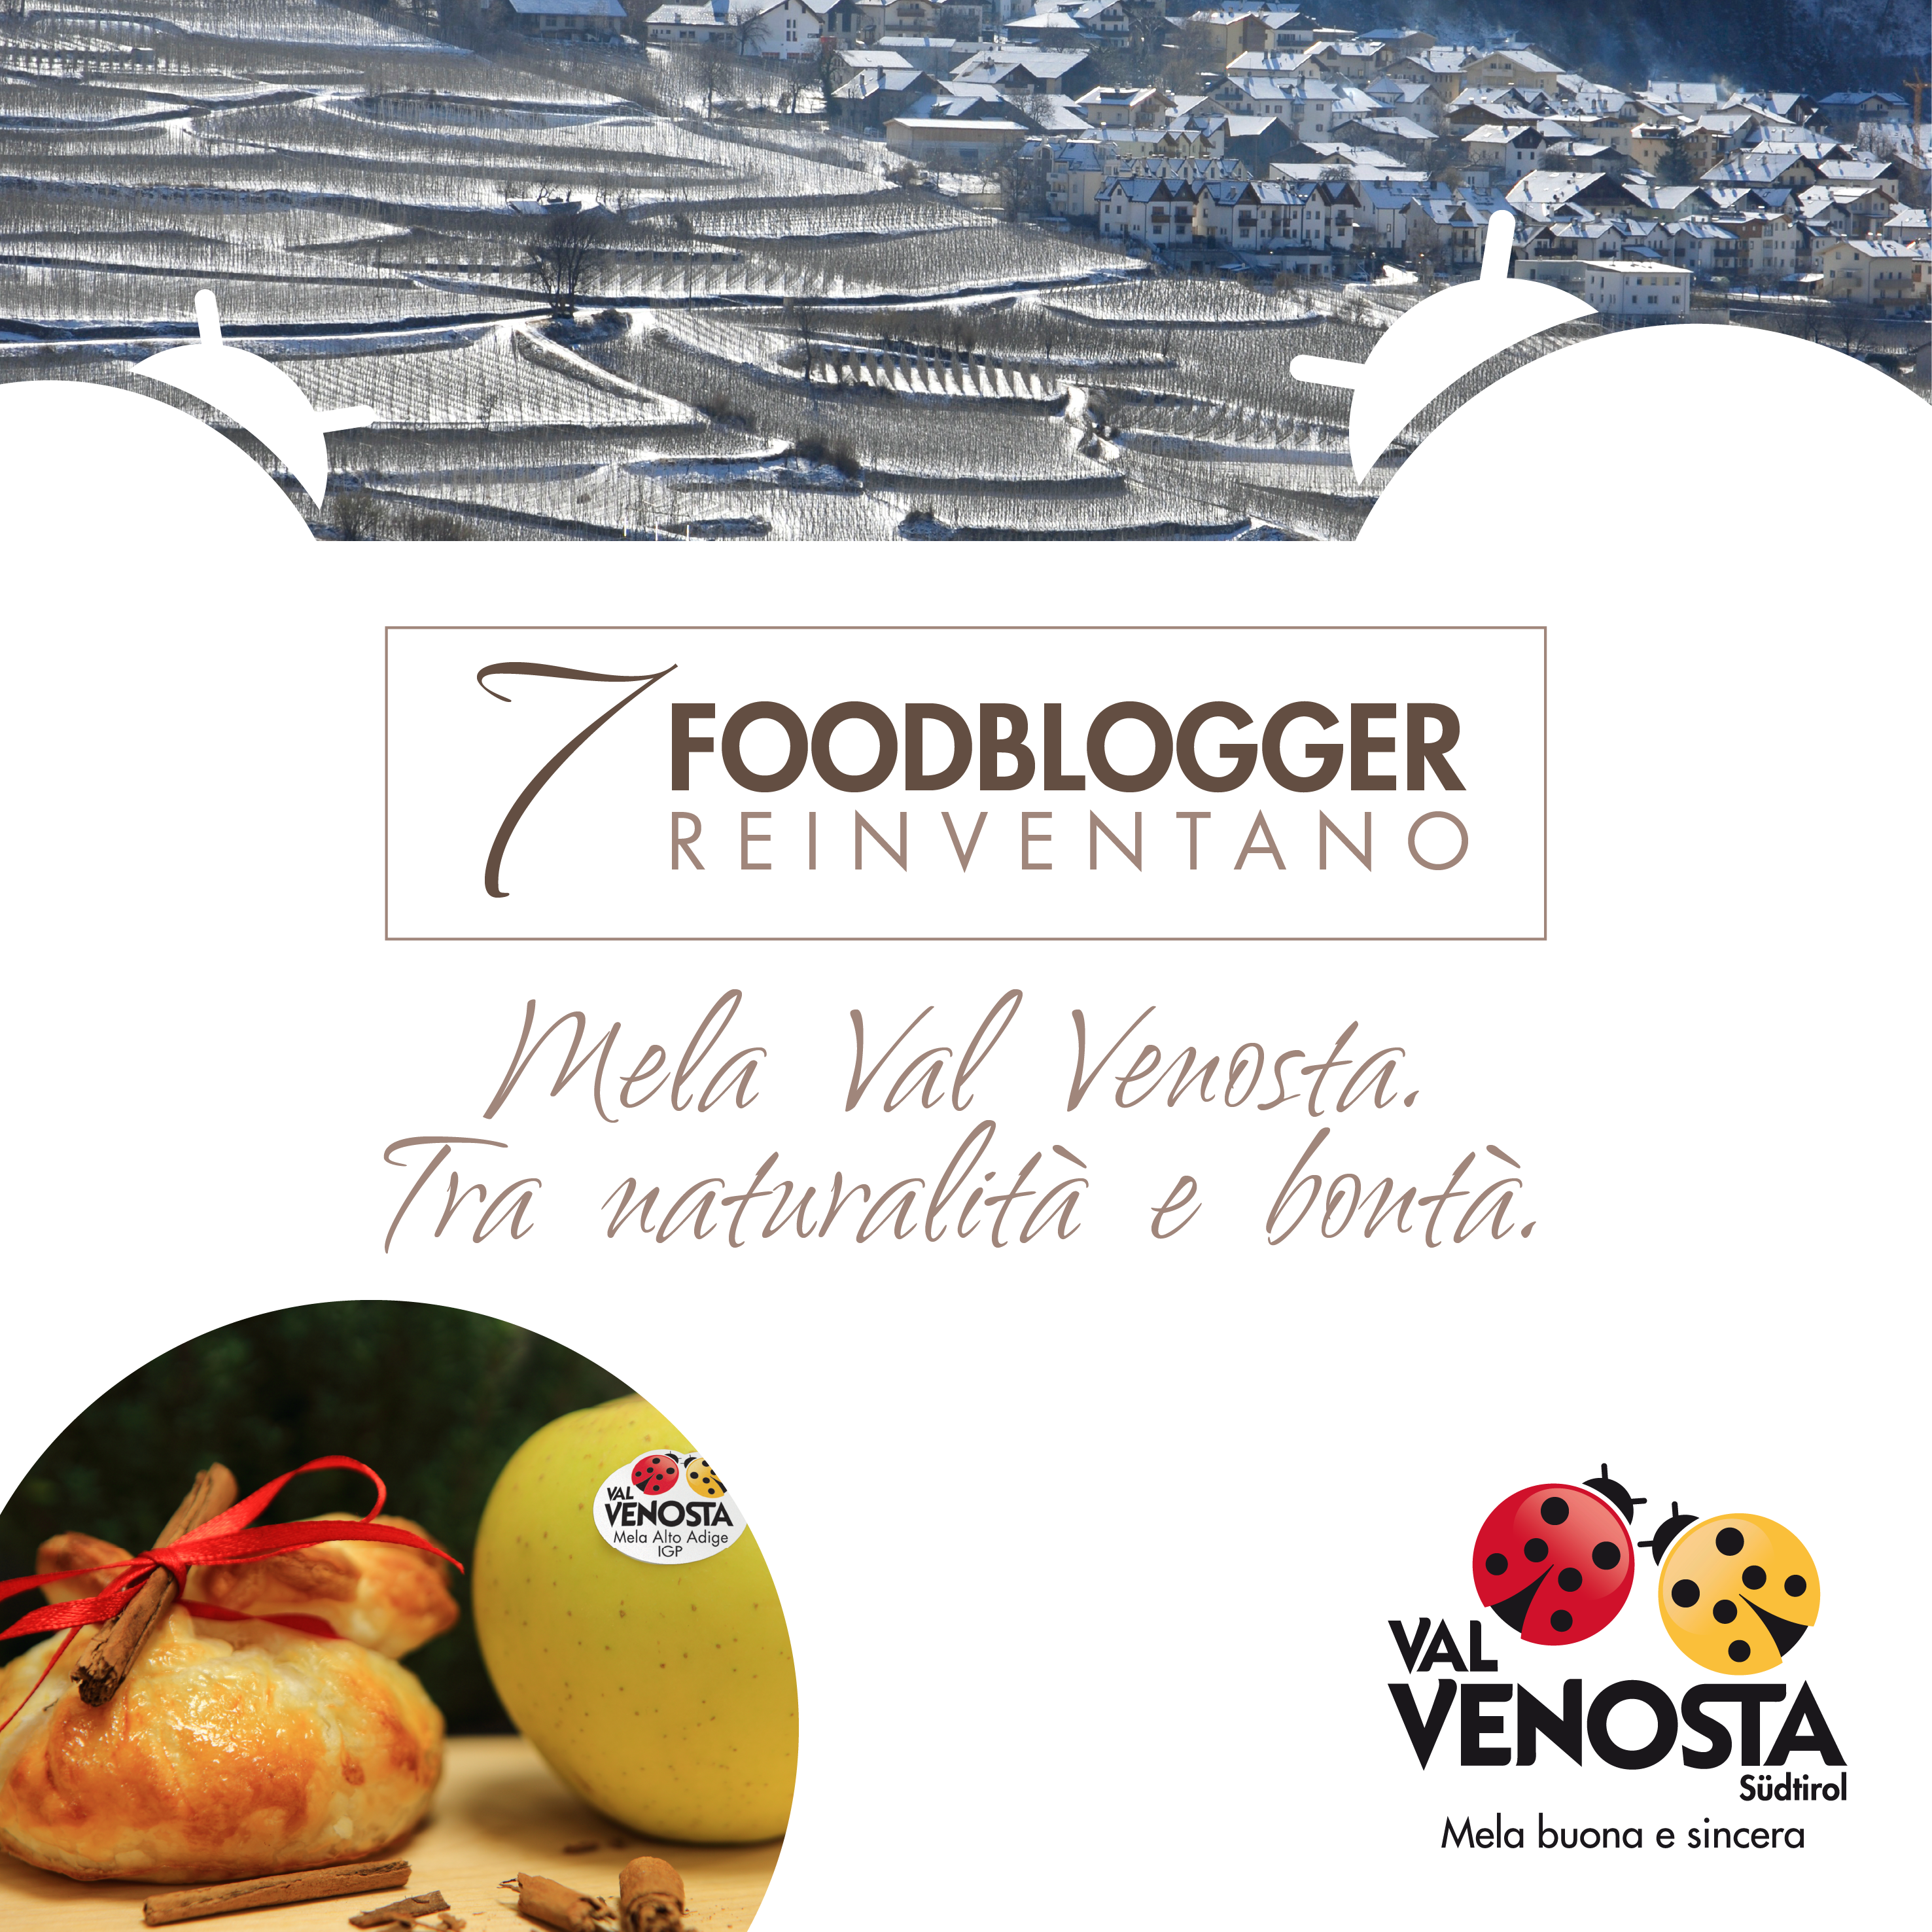 foodblogger-1